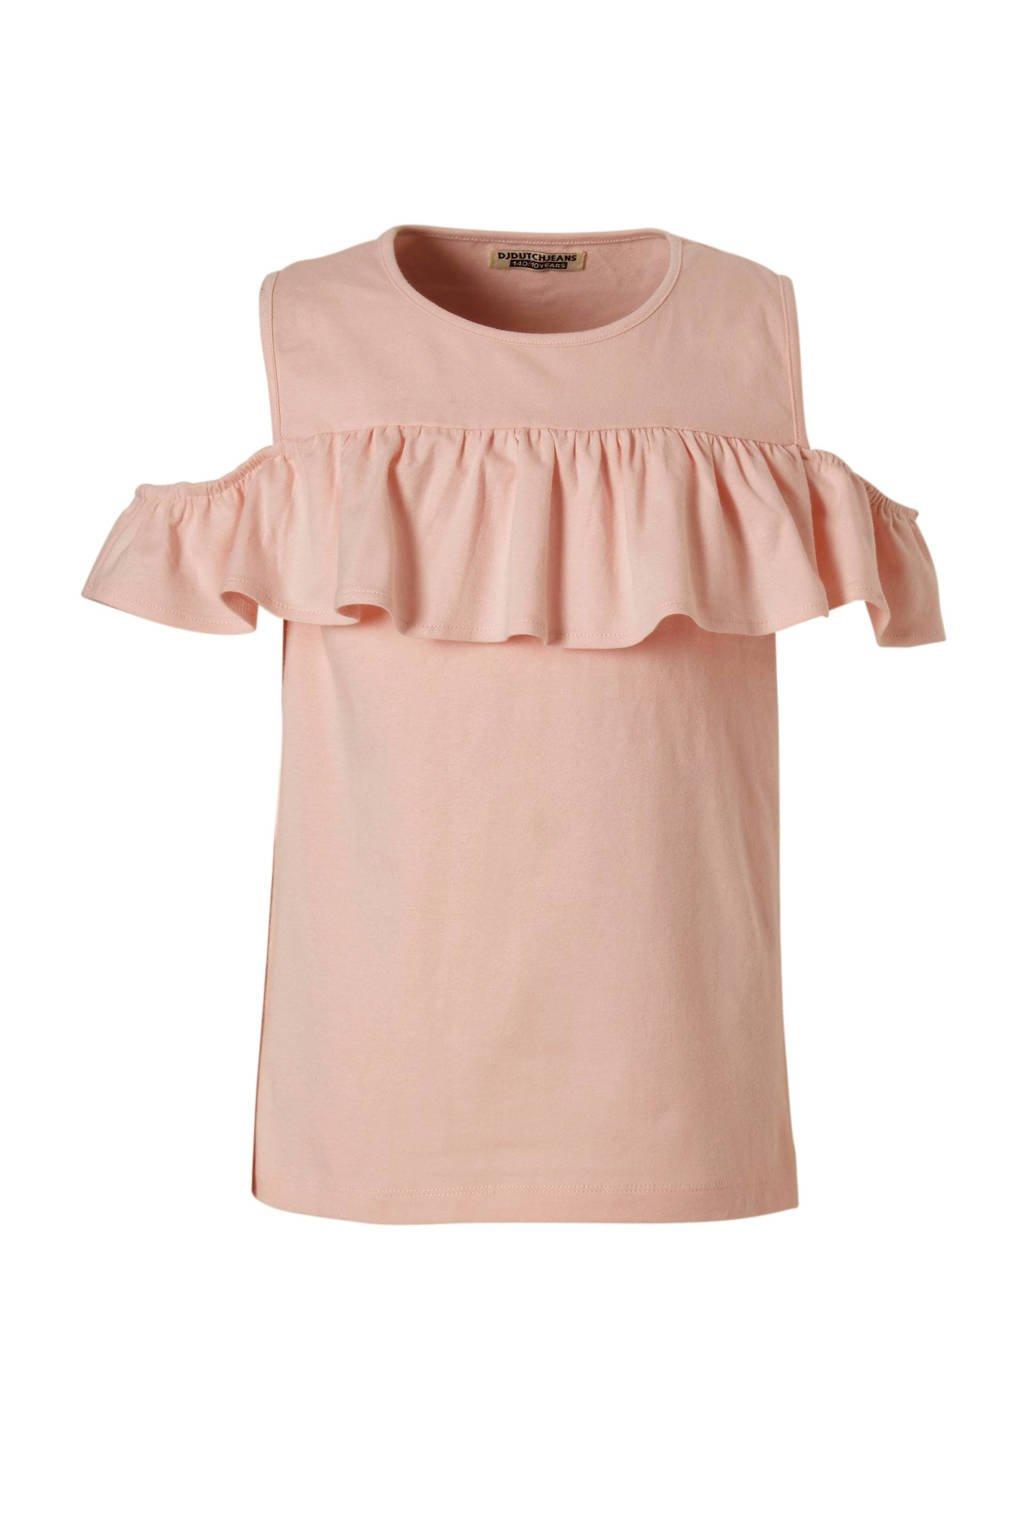 DJ Dutchjeans open shoulder T-shirt, Roze